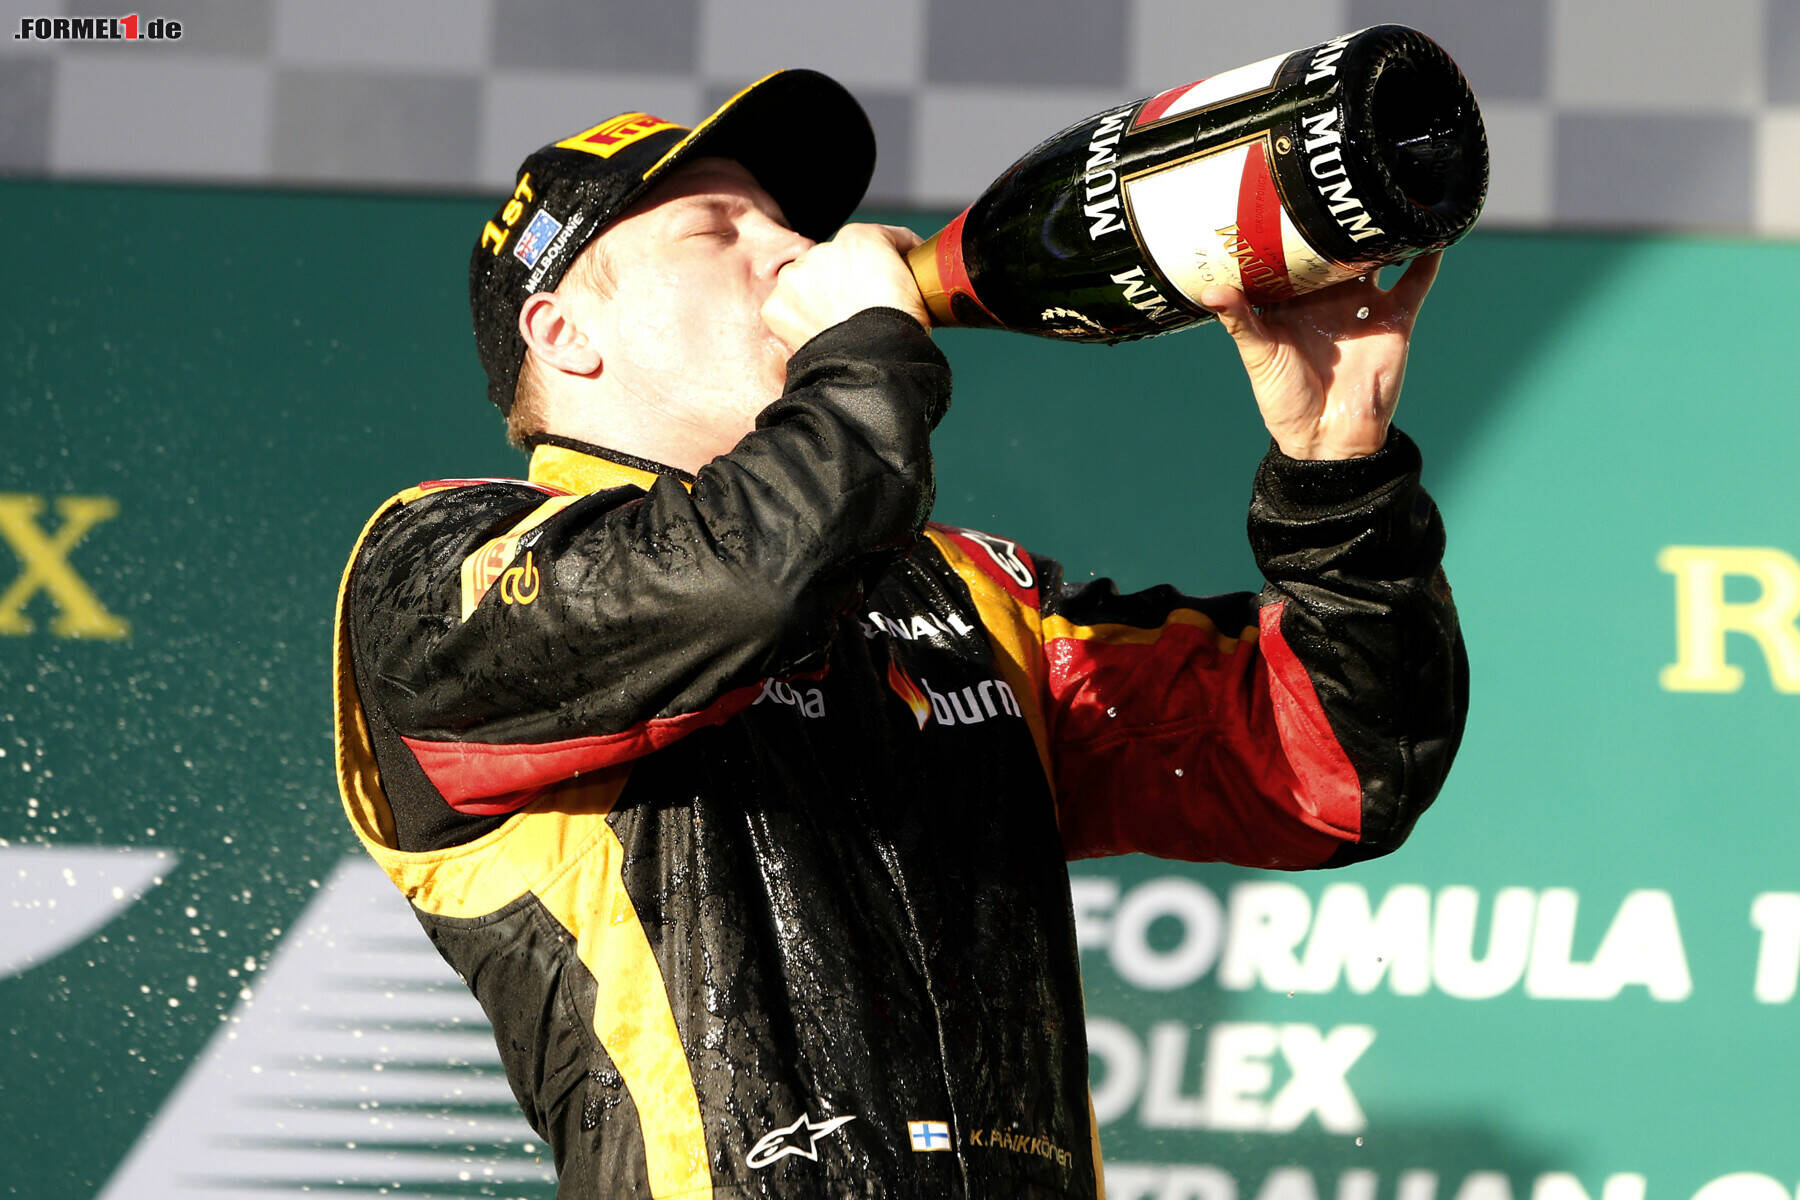 Formel 1 News Heute